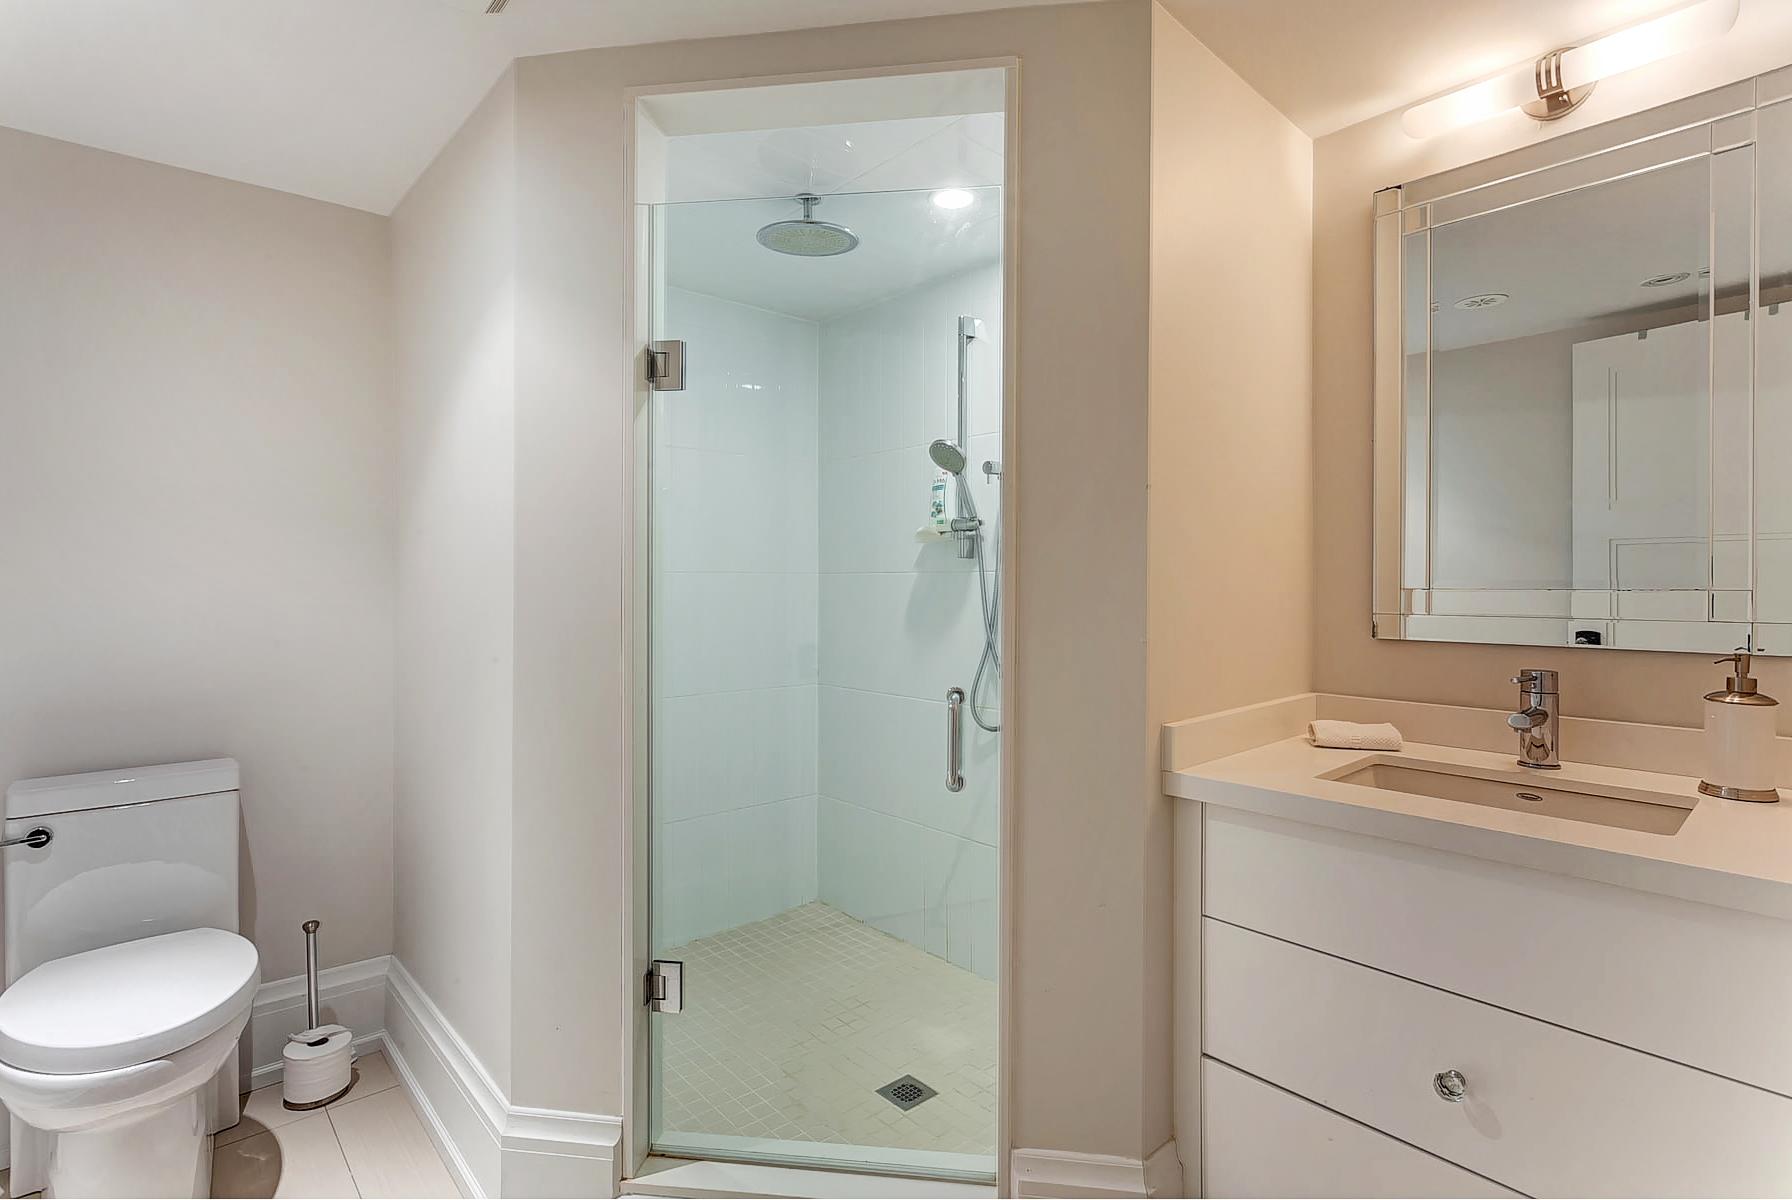 53_Bathroom.jpg